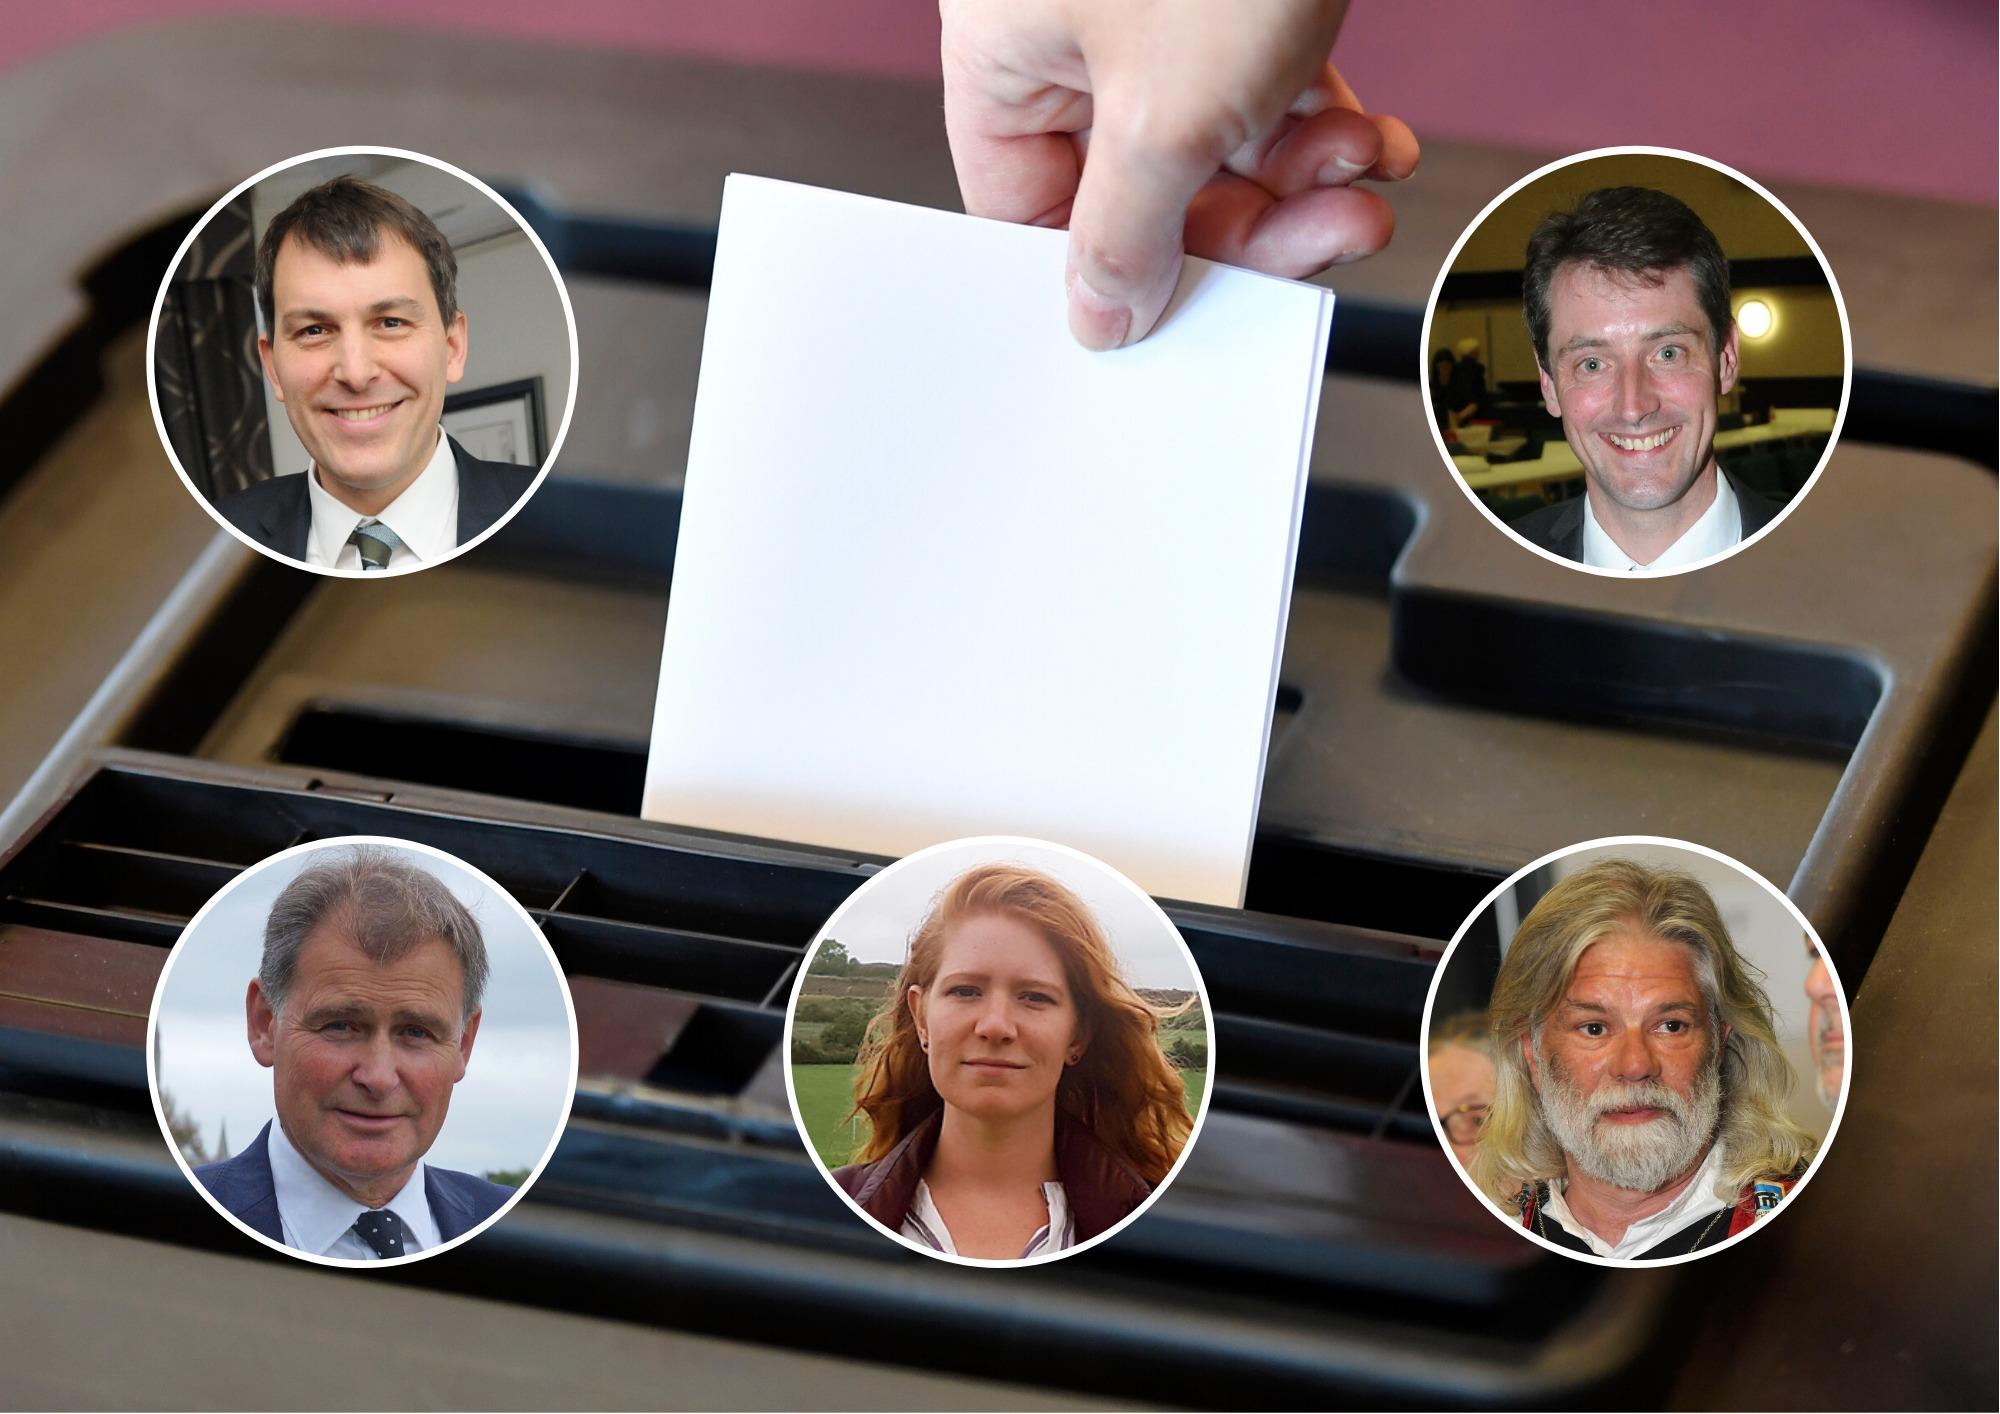 General Election 2019: Meet the candidates for Salisbury - Salisbury Journal